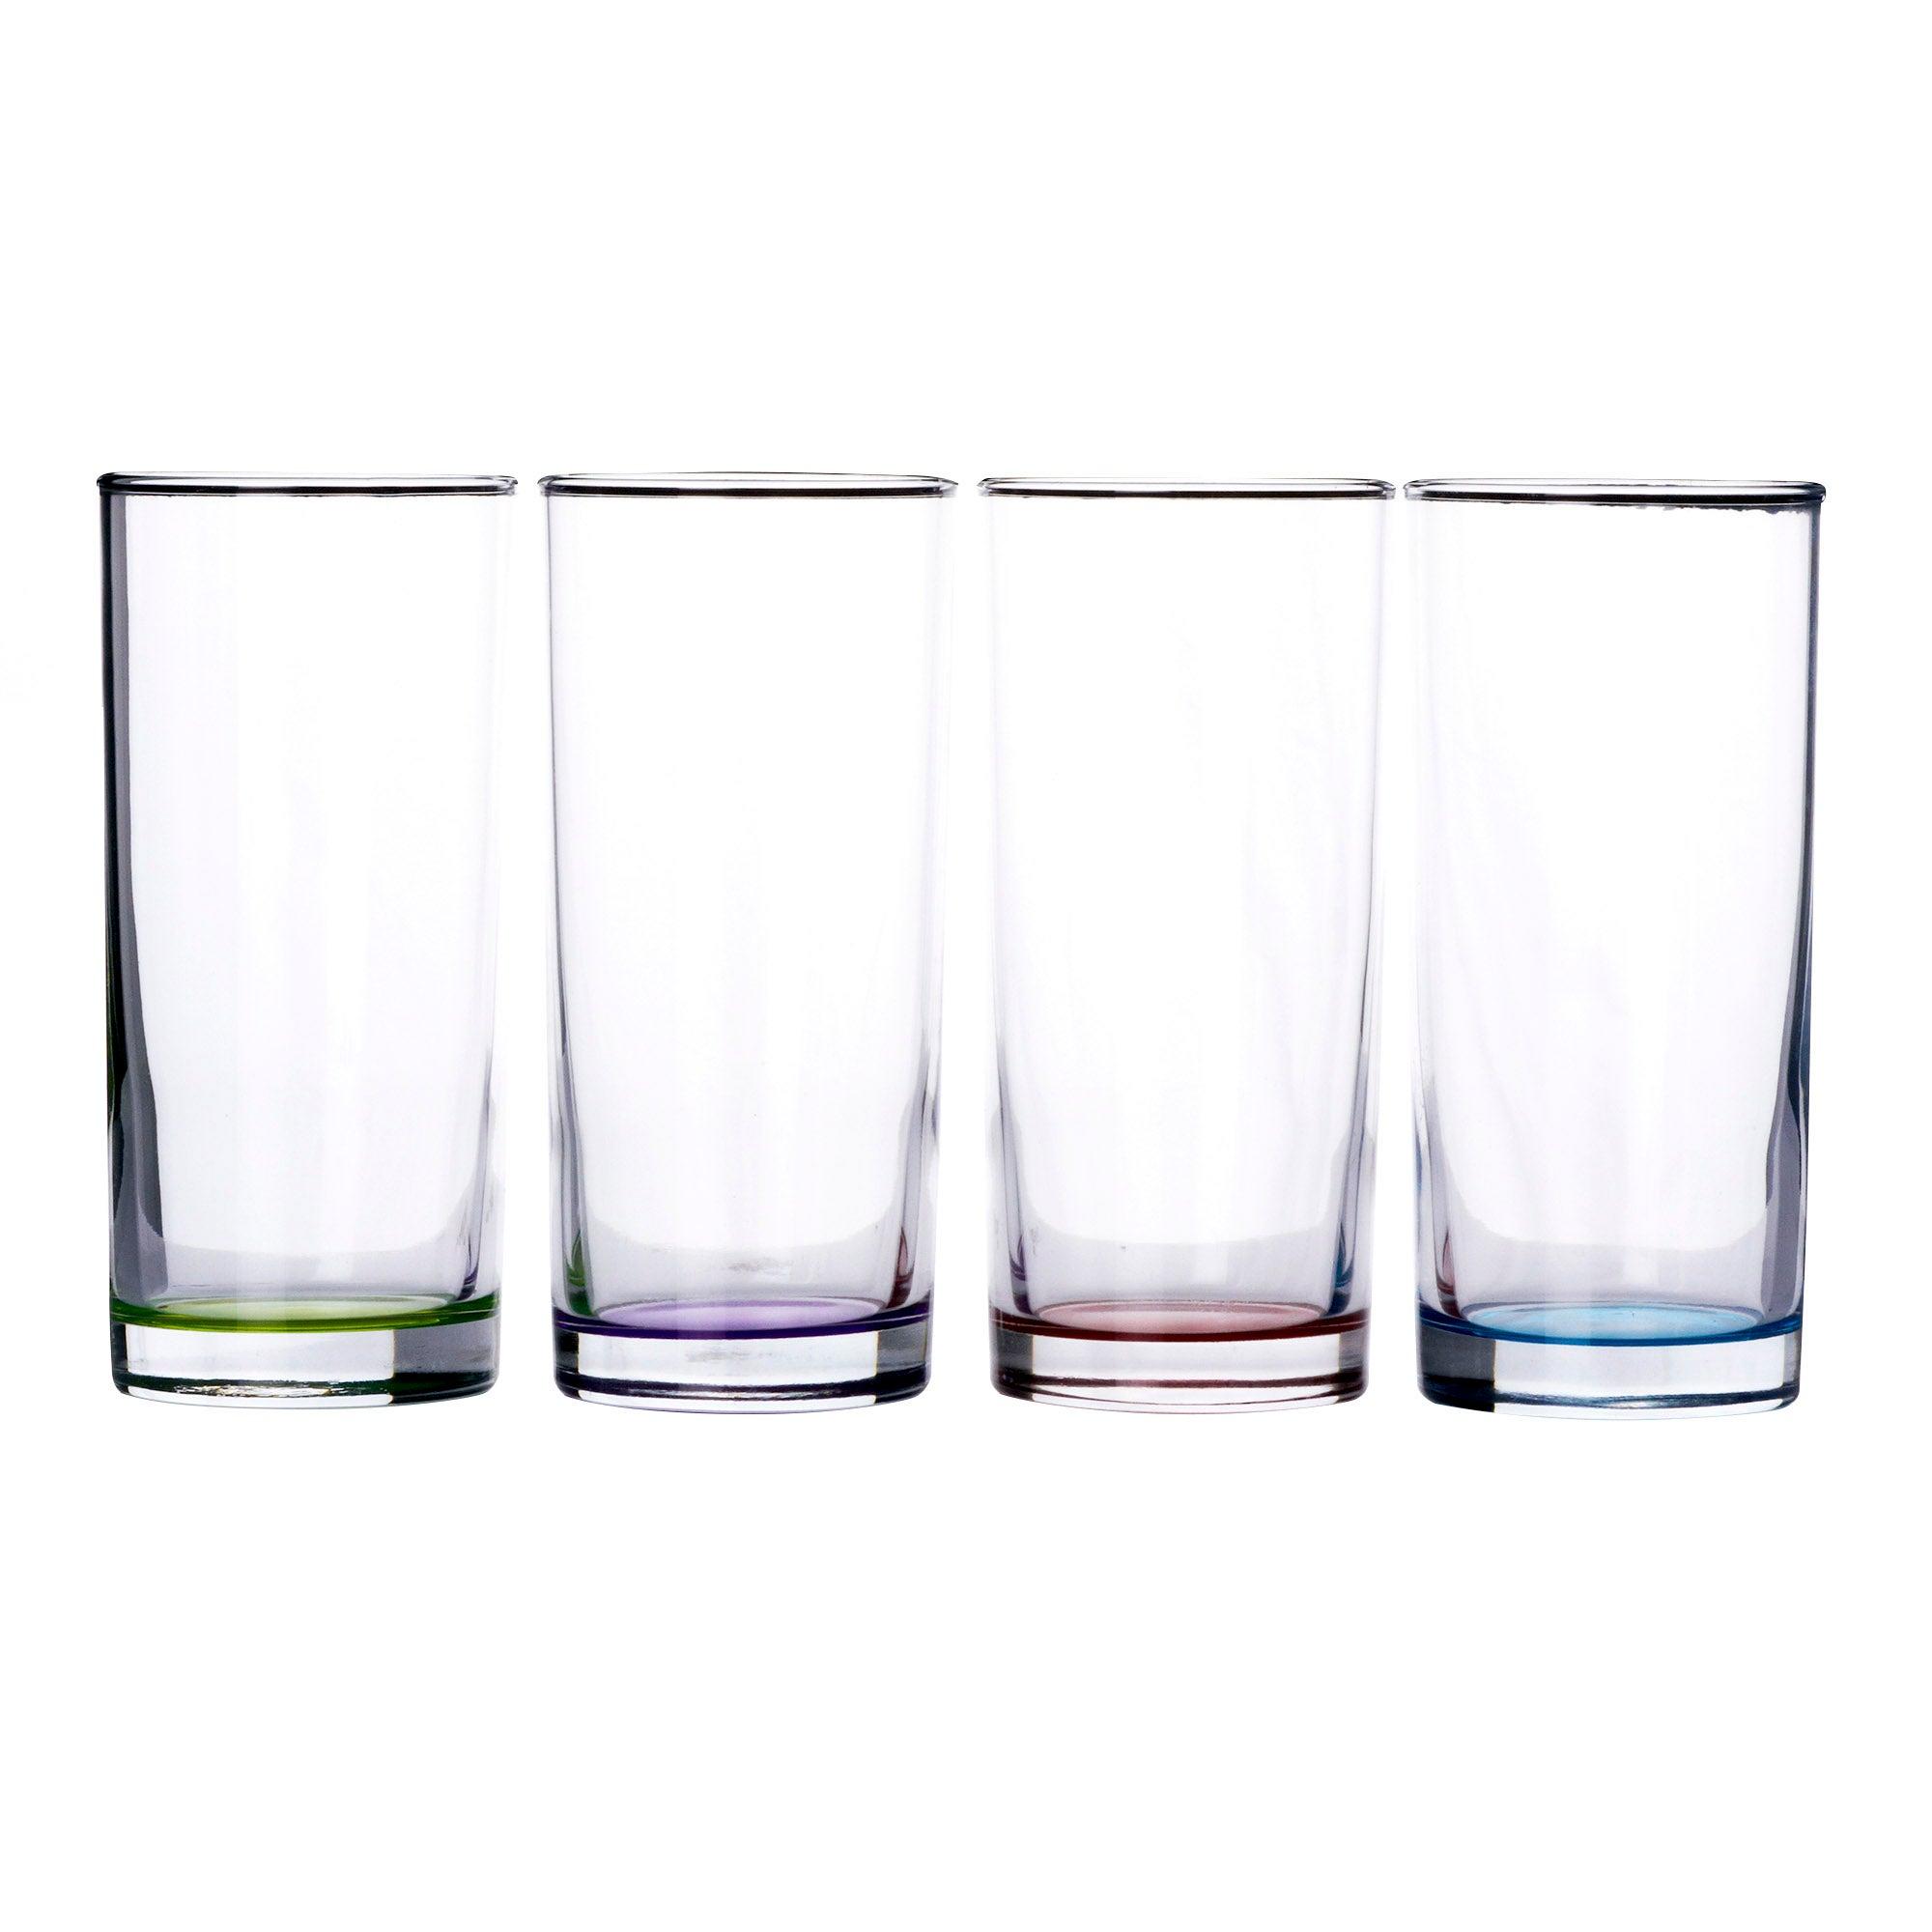 4 Hi-Ball Tumbler Glasses With Sprayed Base